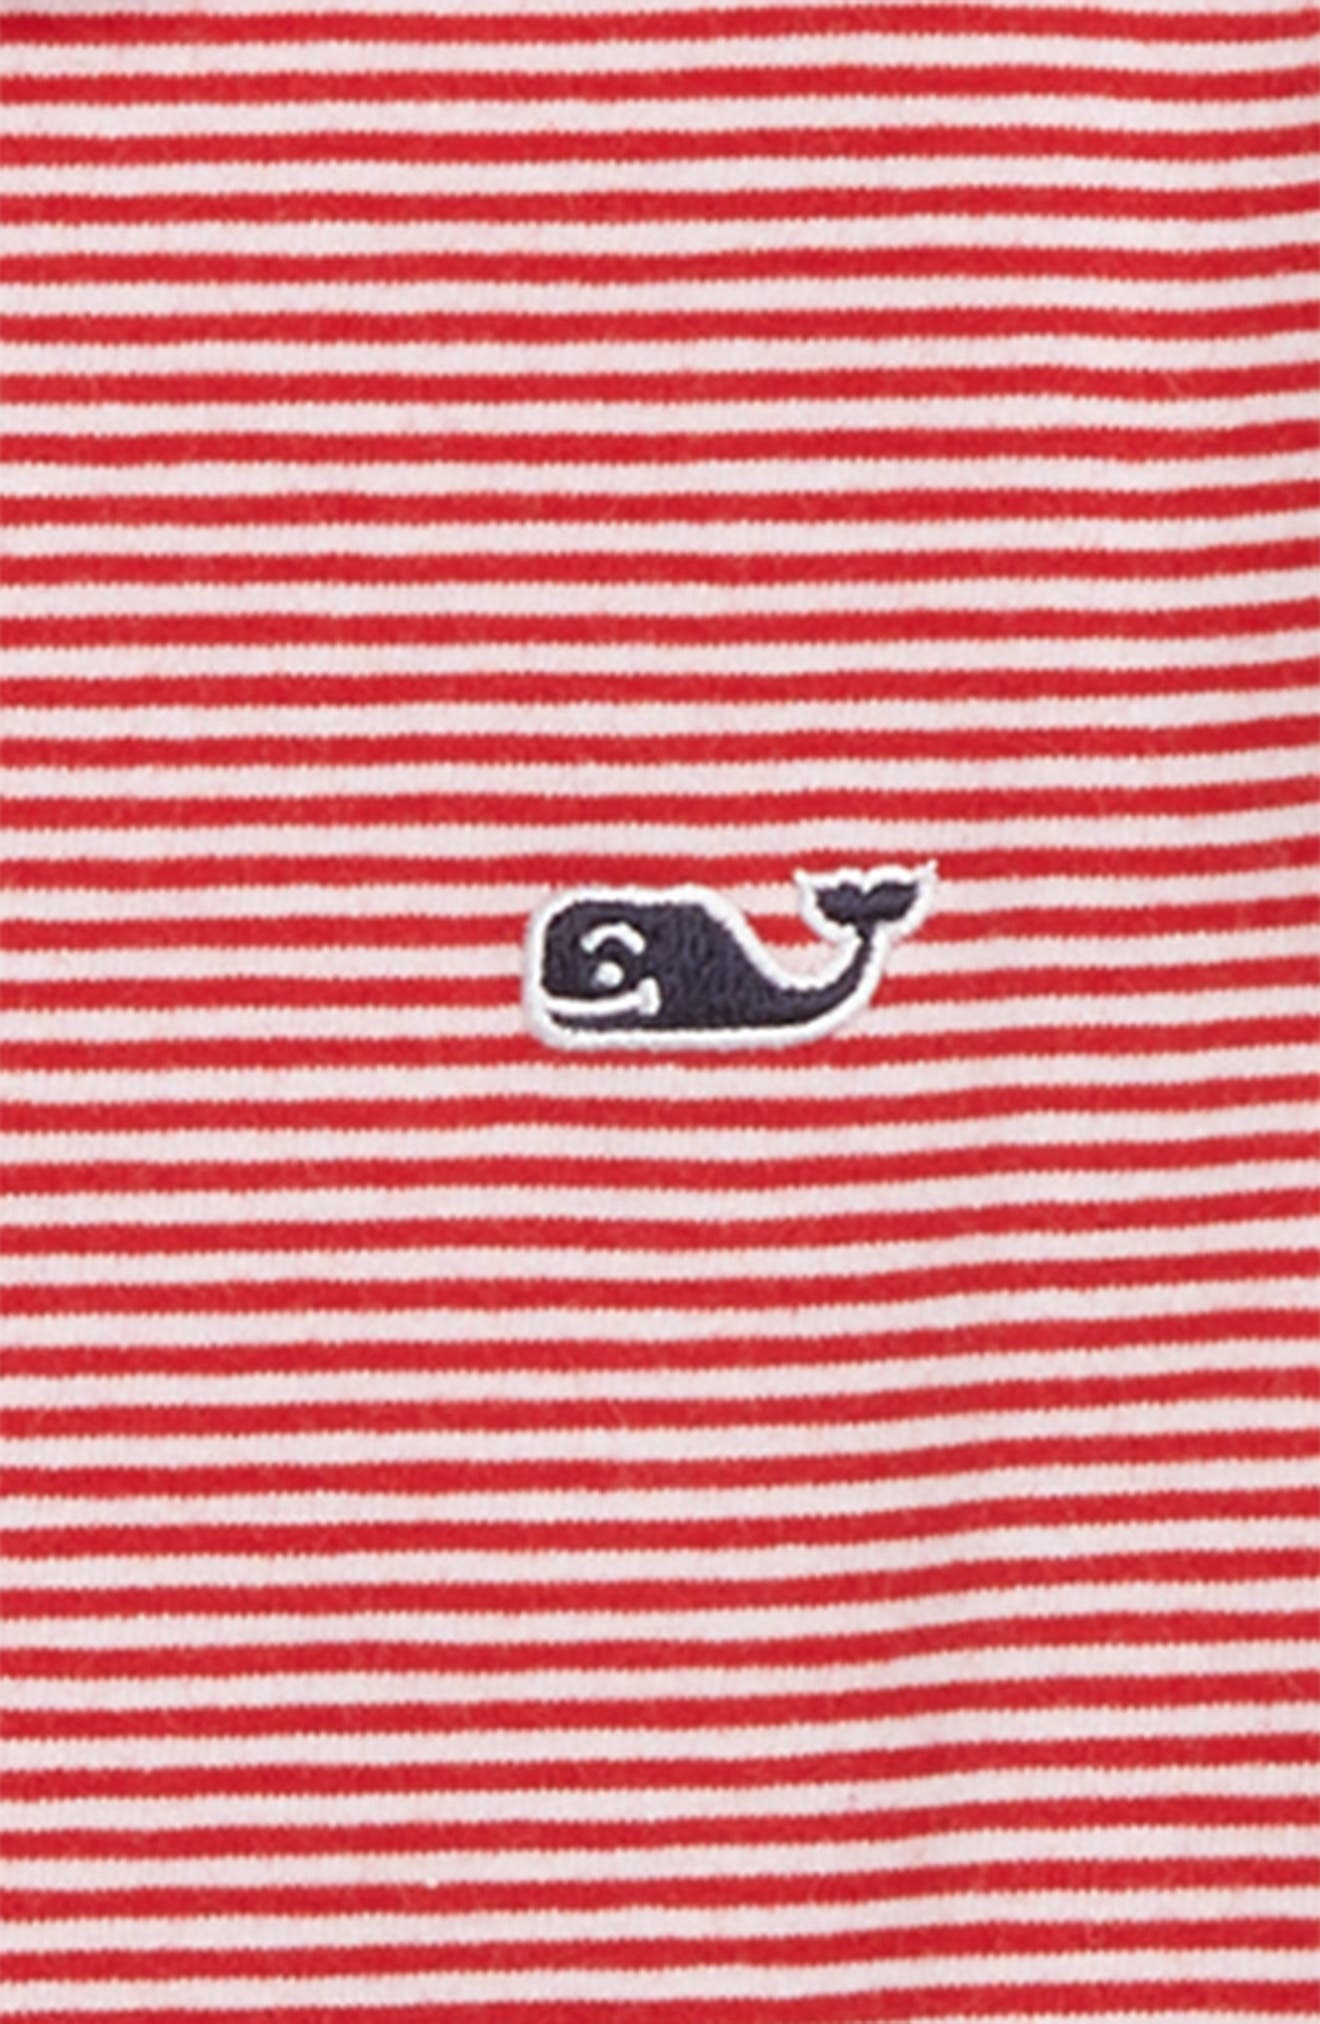 Stripe Edgartown Performance Polo,                             Alternate thumbnail 2, color,                             CALYPSO RED